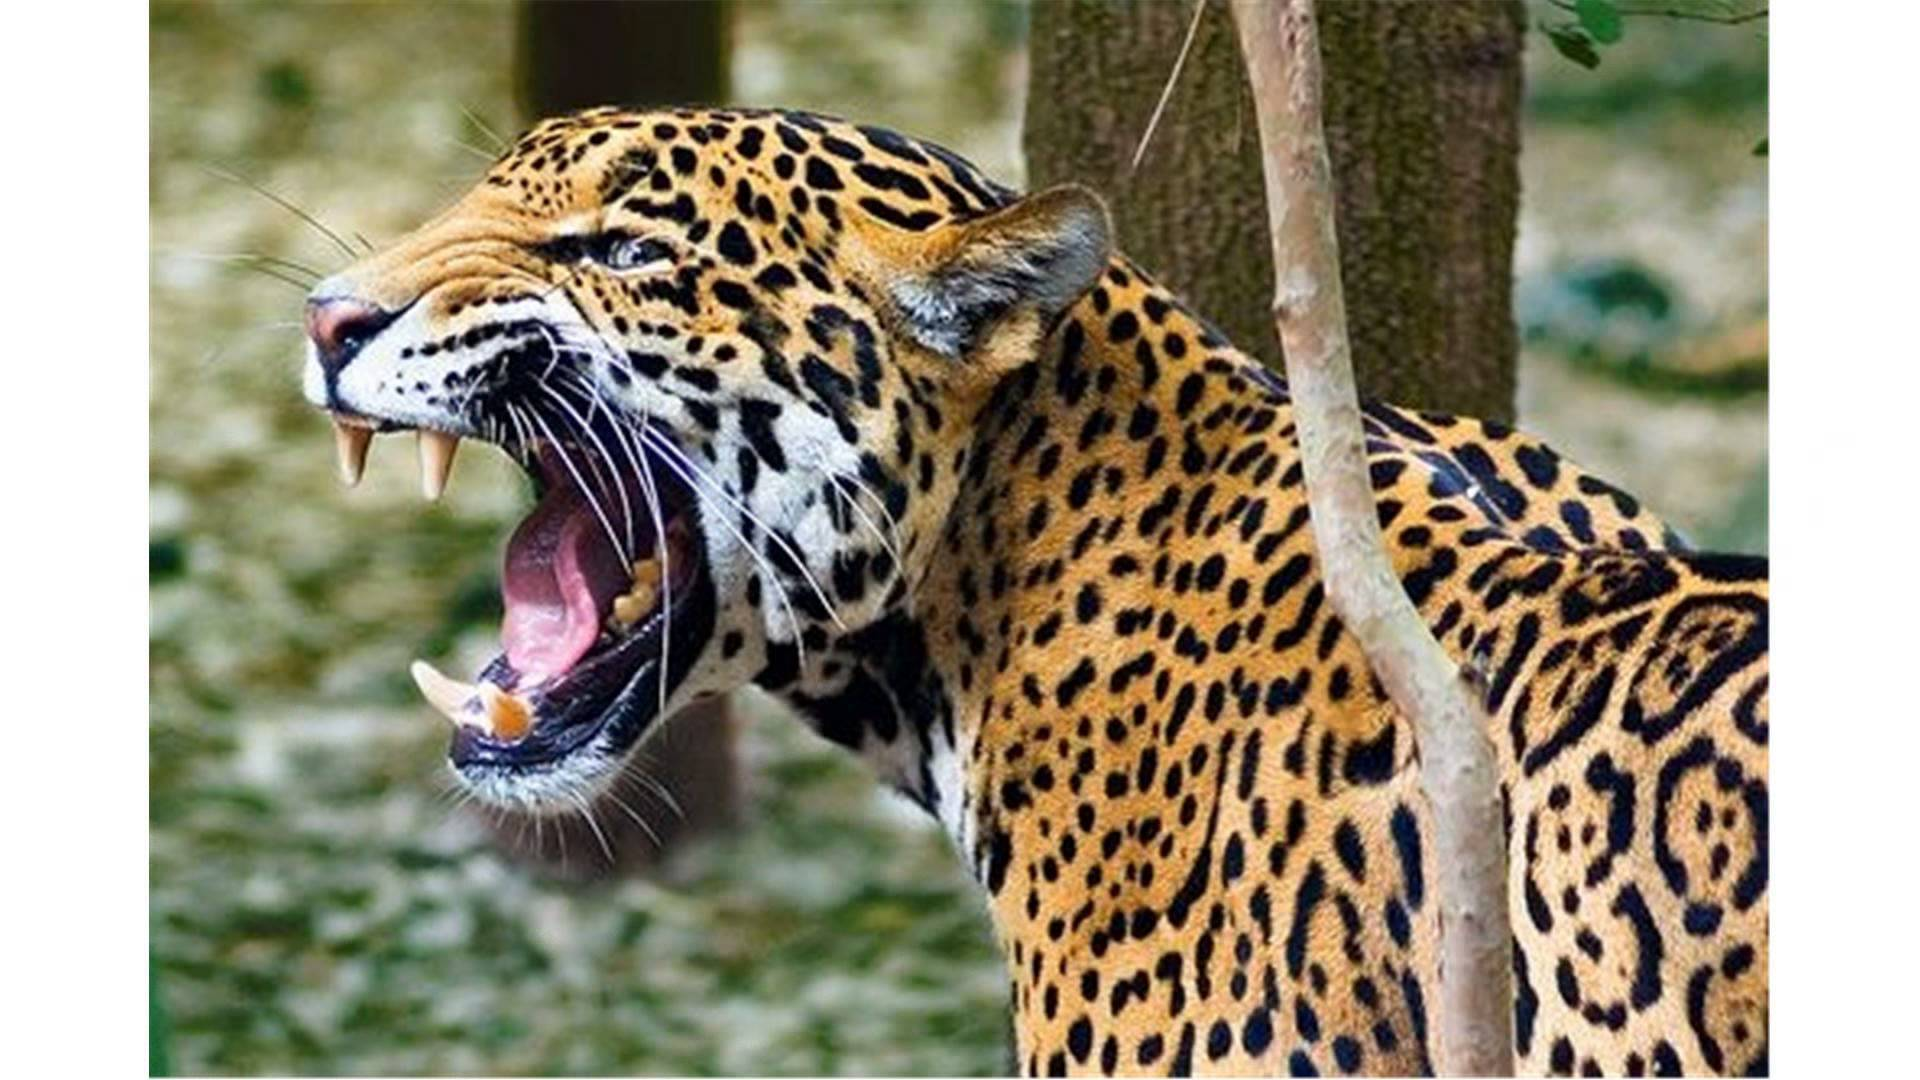 Jaguar roar photo